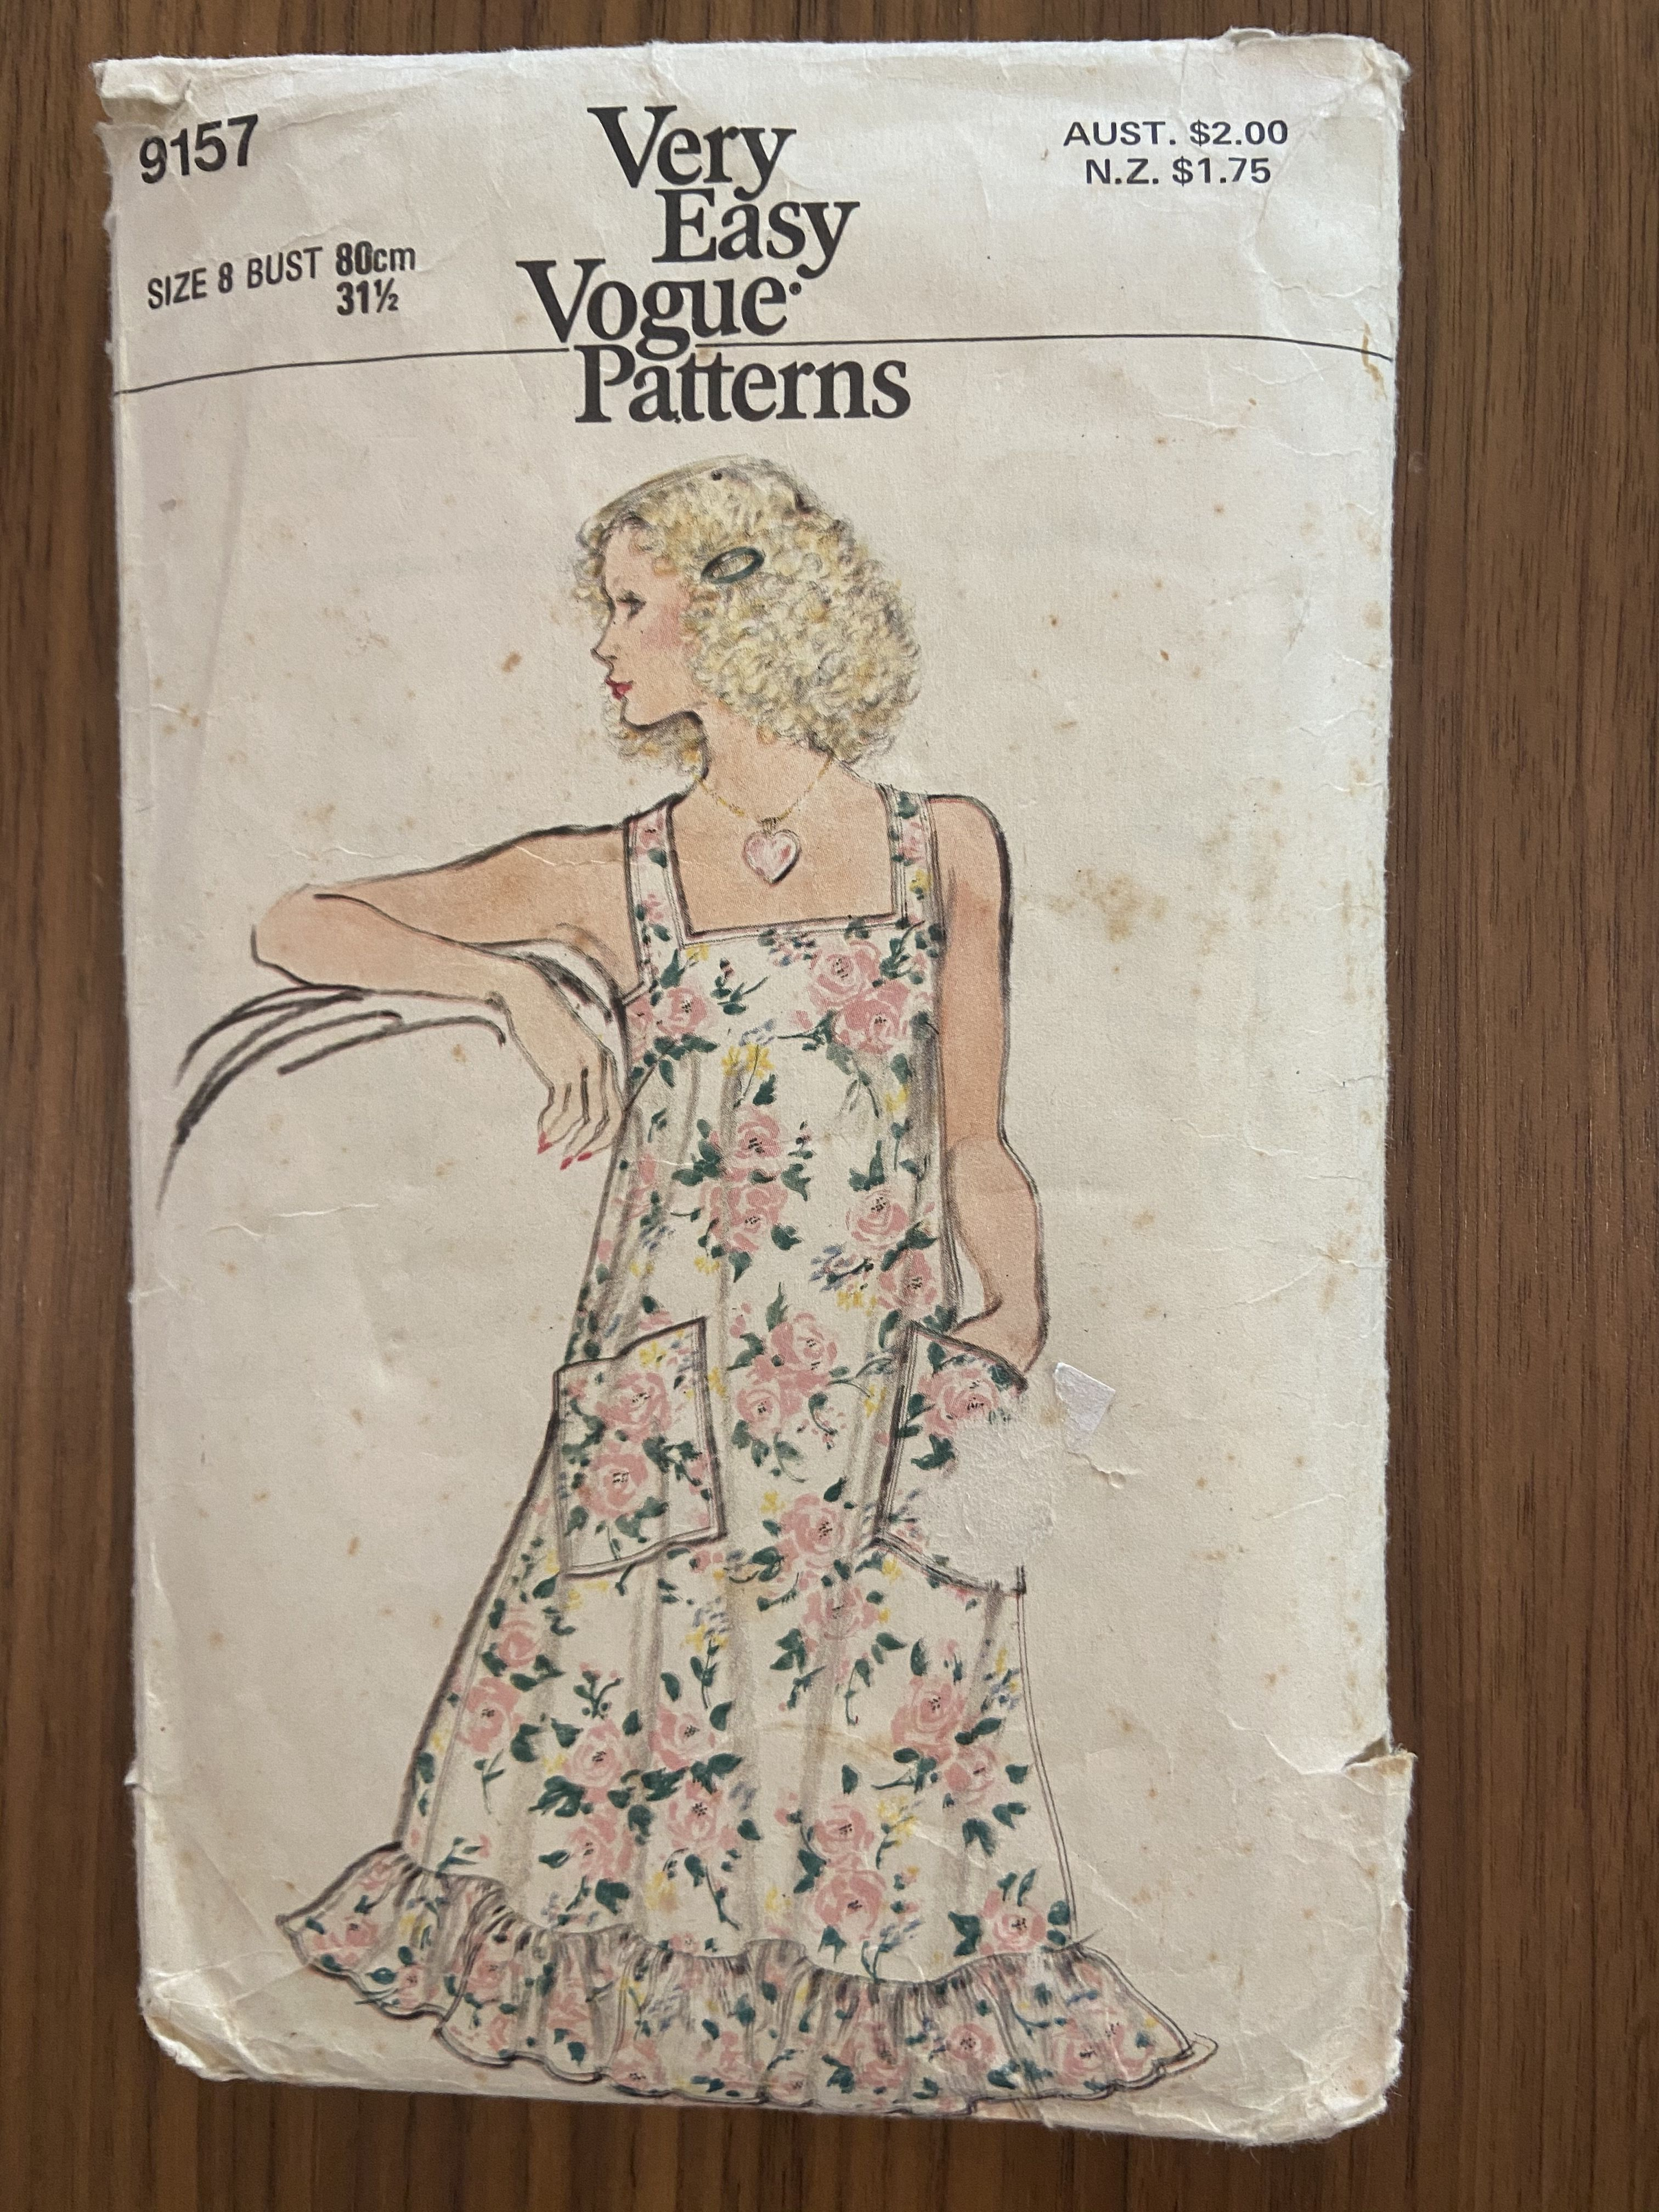 Vogue 9157 vintage 1970s dress sewing pattern for sale